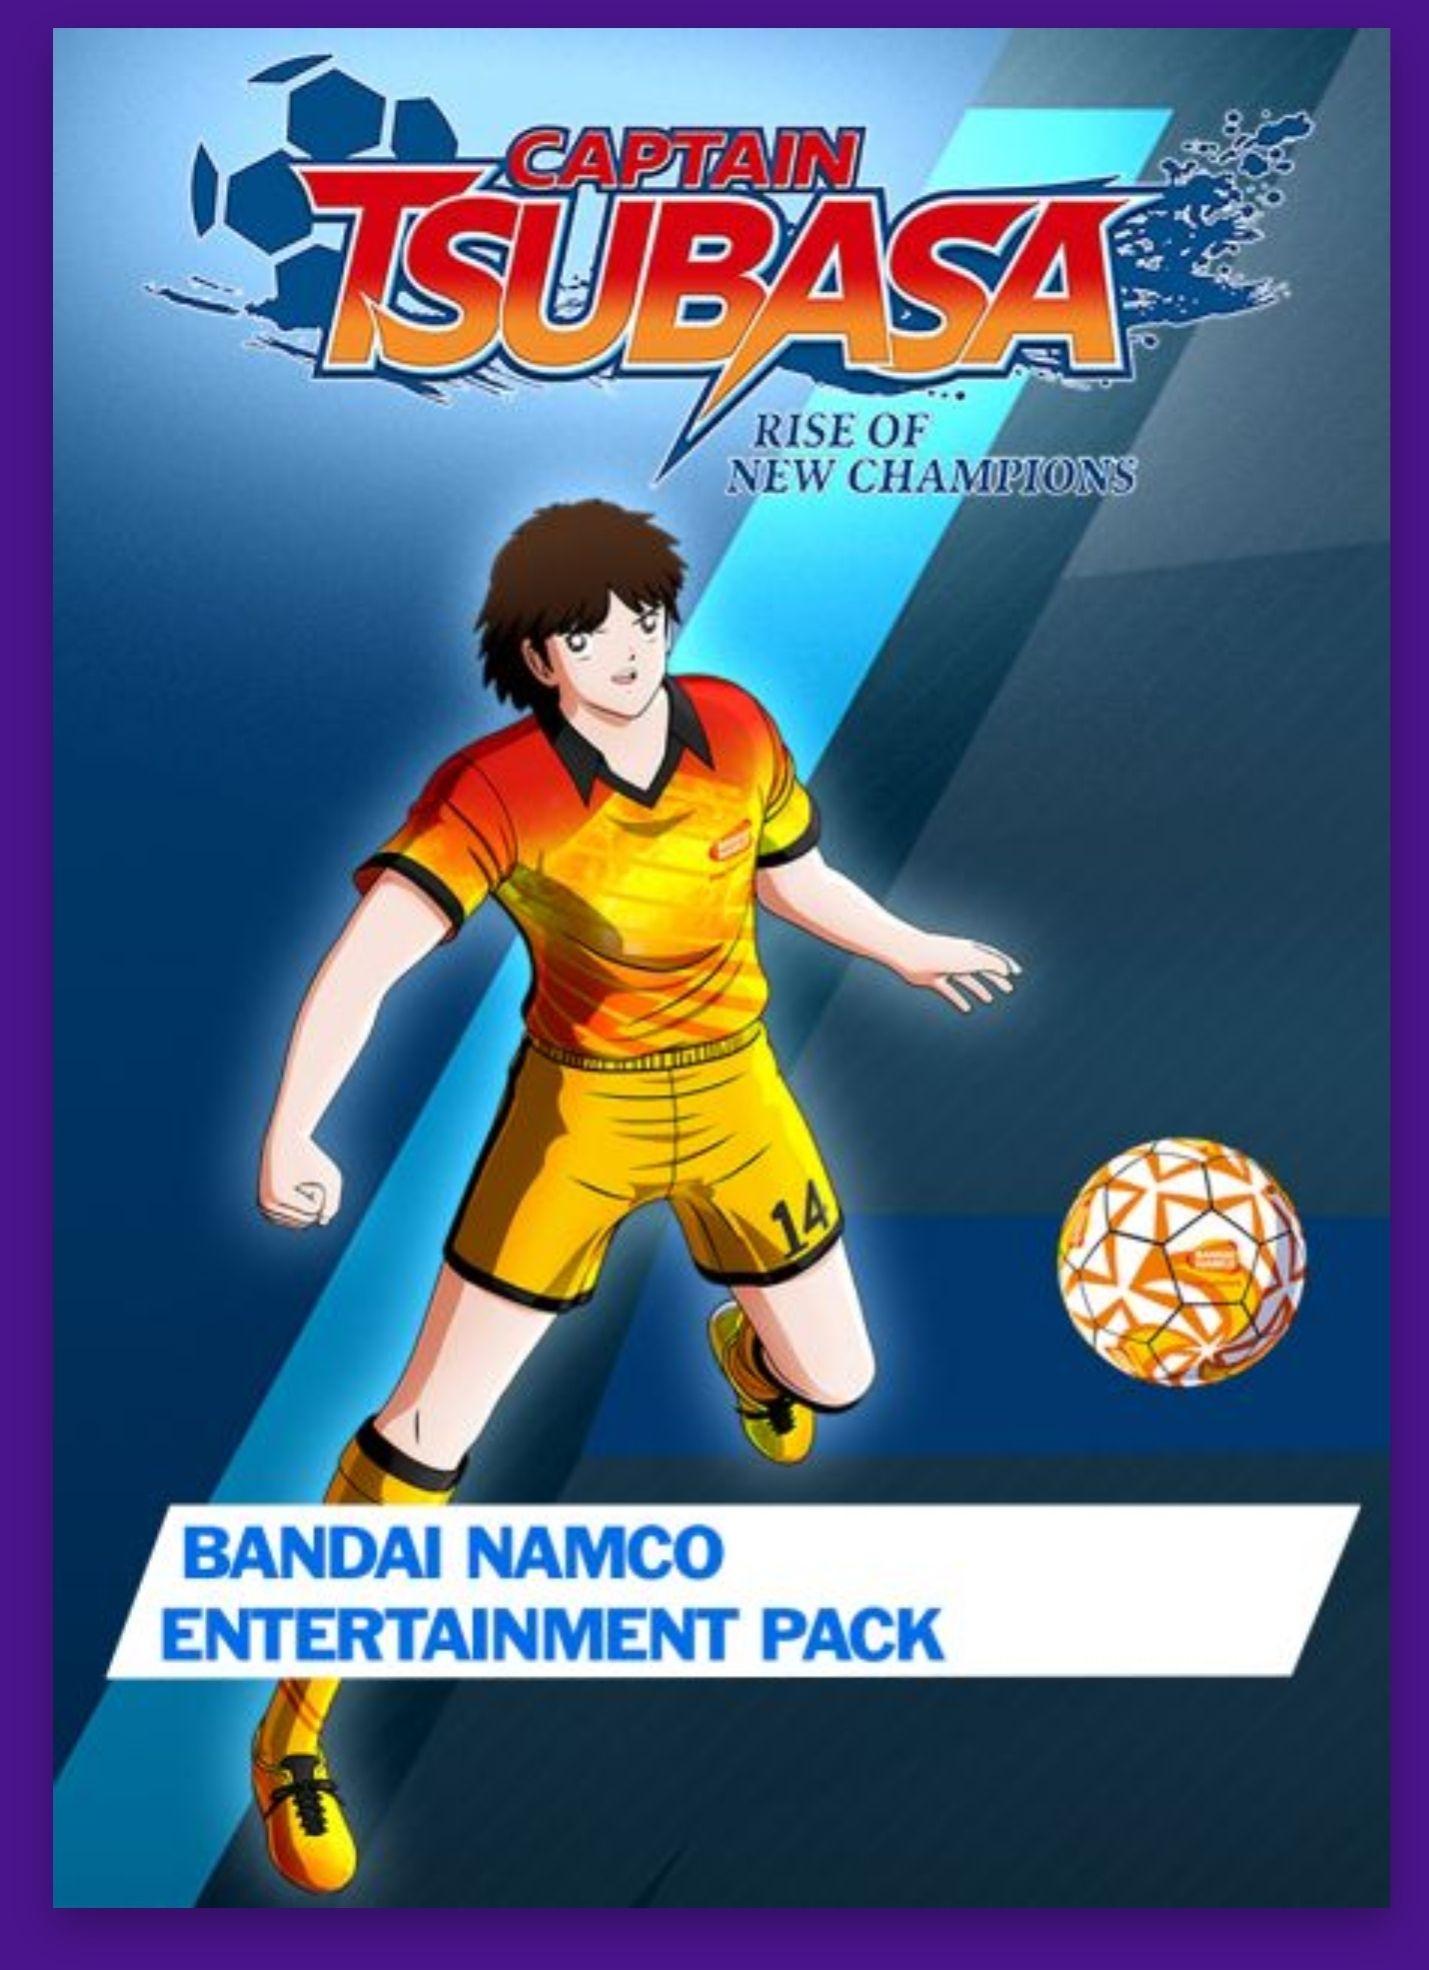 Pack EU DLC GRATIS CAPTAIN TSUBASA: RISE OF NEW CHAMPIONS BANDAI NAMCO ENTERTAINMENT